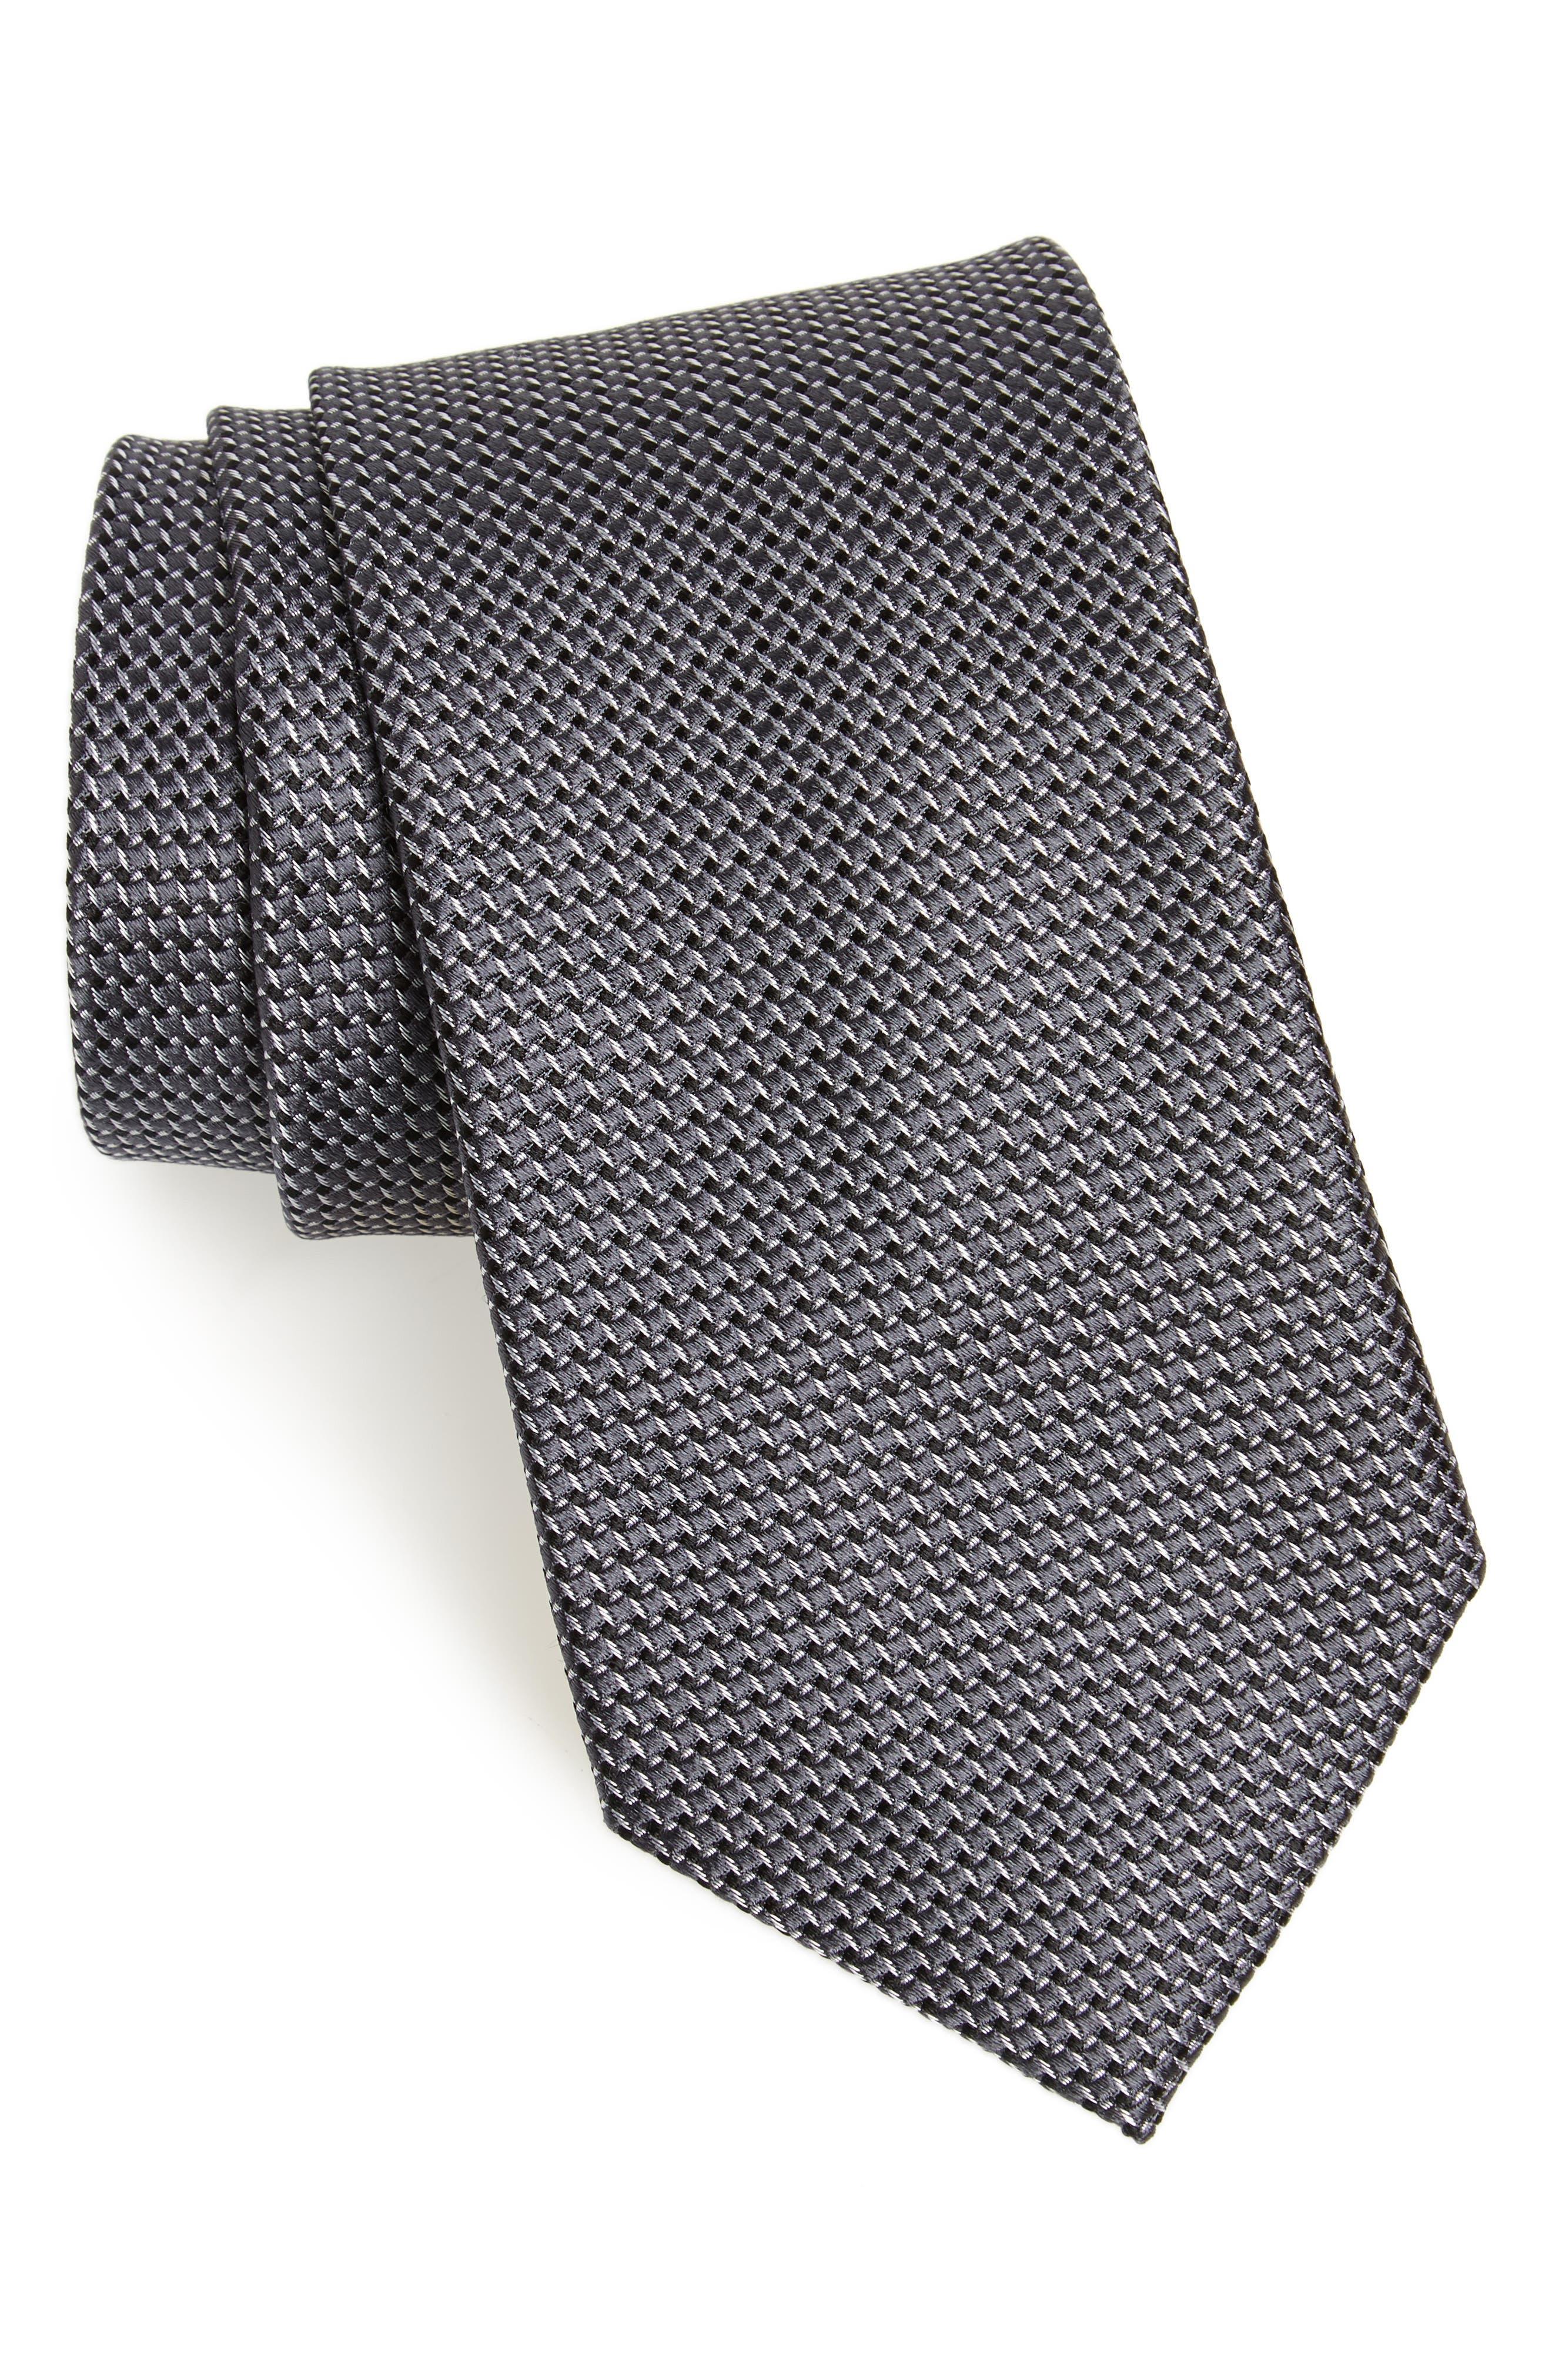 Russo Geo Print Silk Tie,                         Main,                         color, BLACK